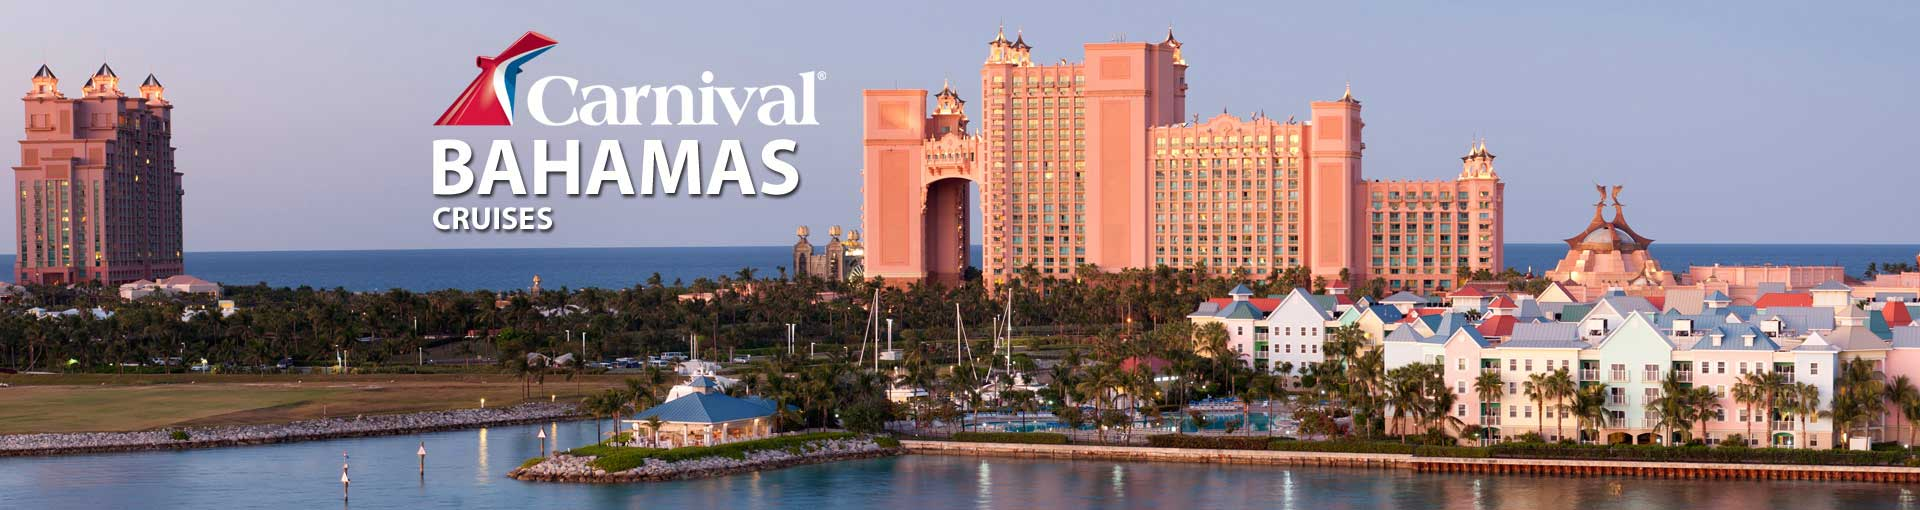 Carnival Bahamas Cruises 2017 And 2018 Bahamas Carnival Cruises The Cruise Web